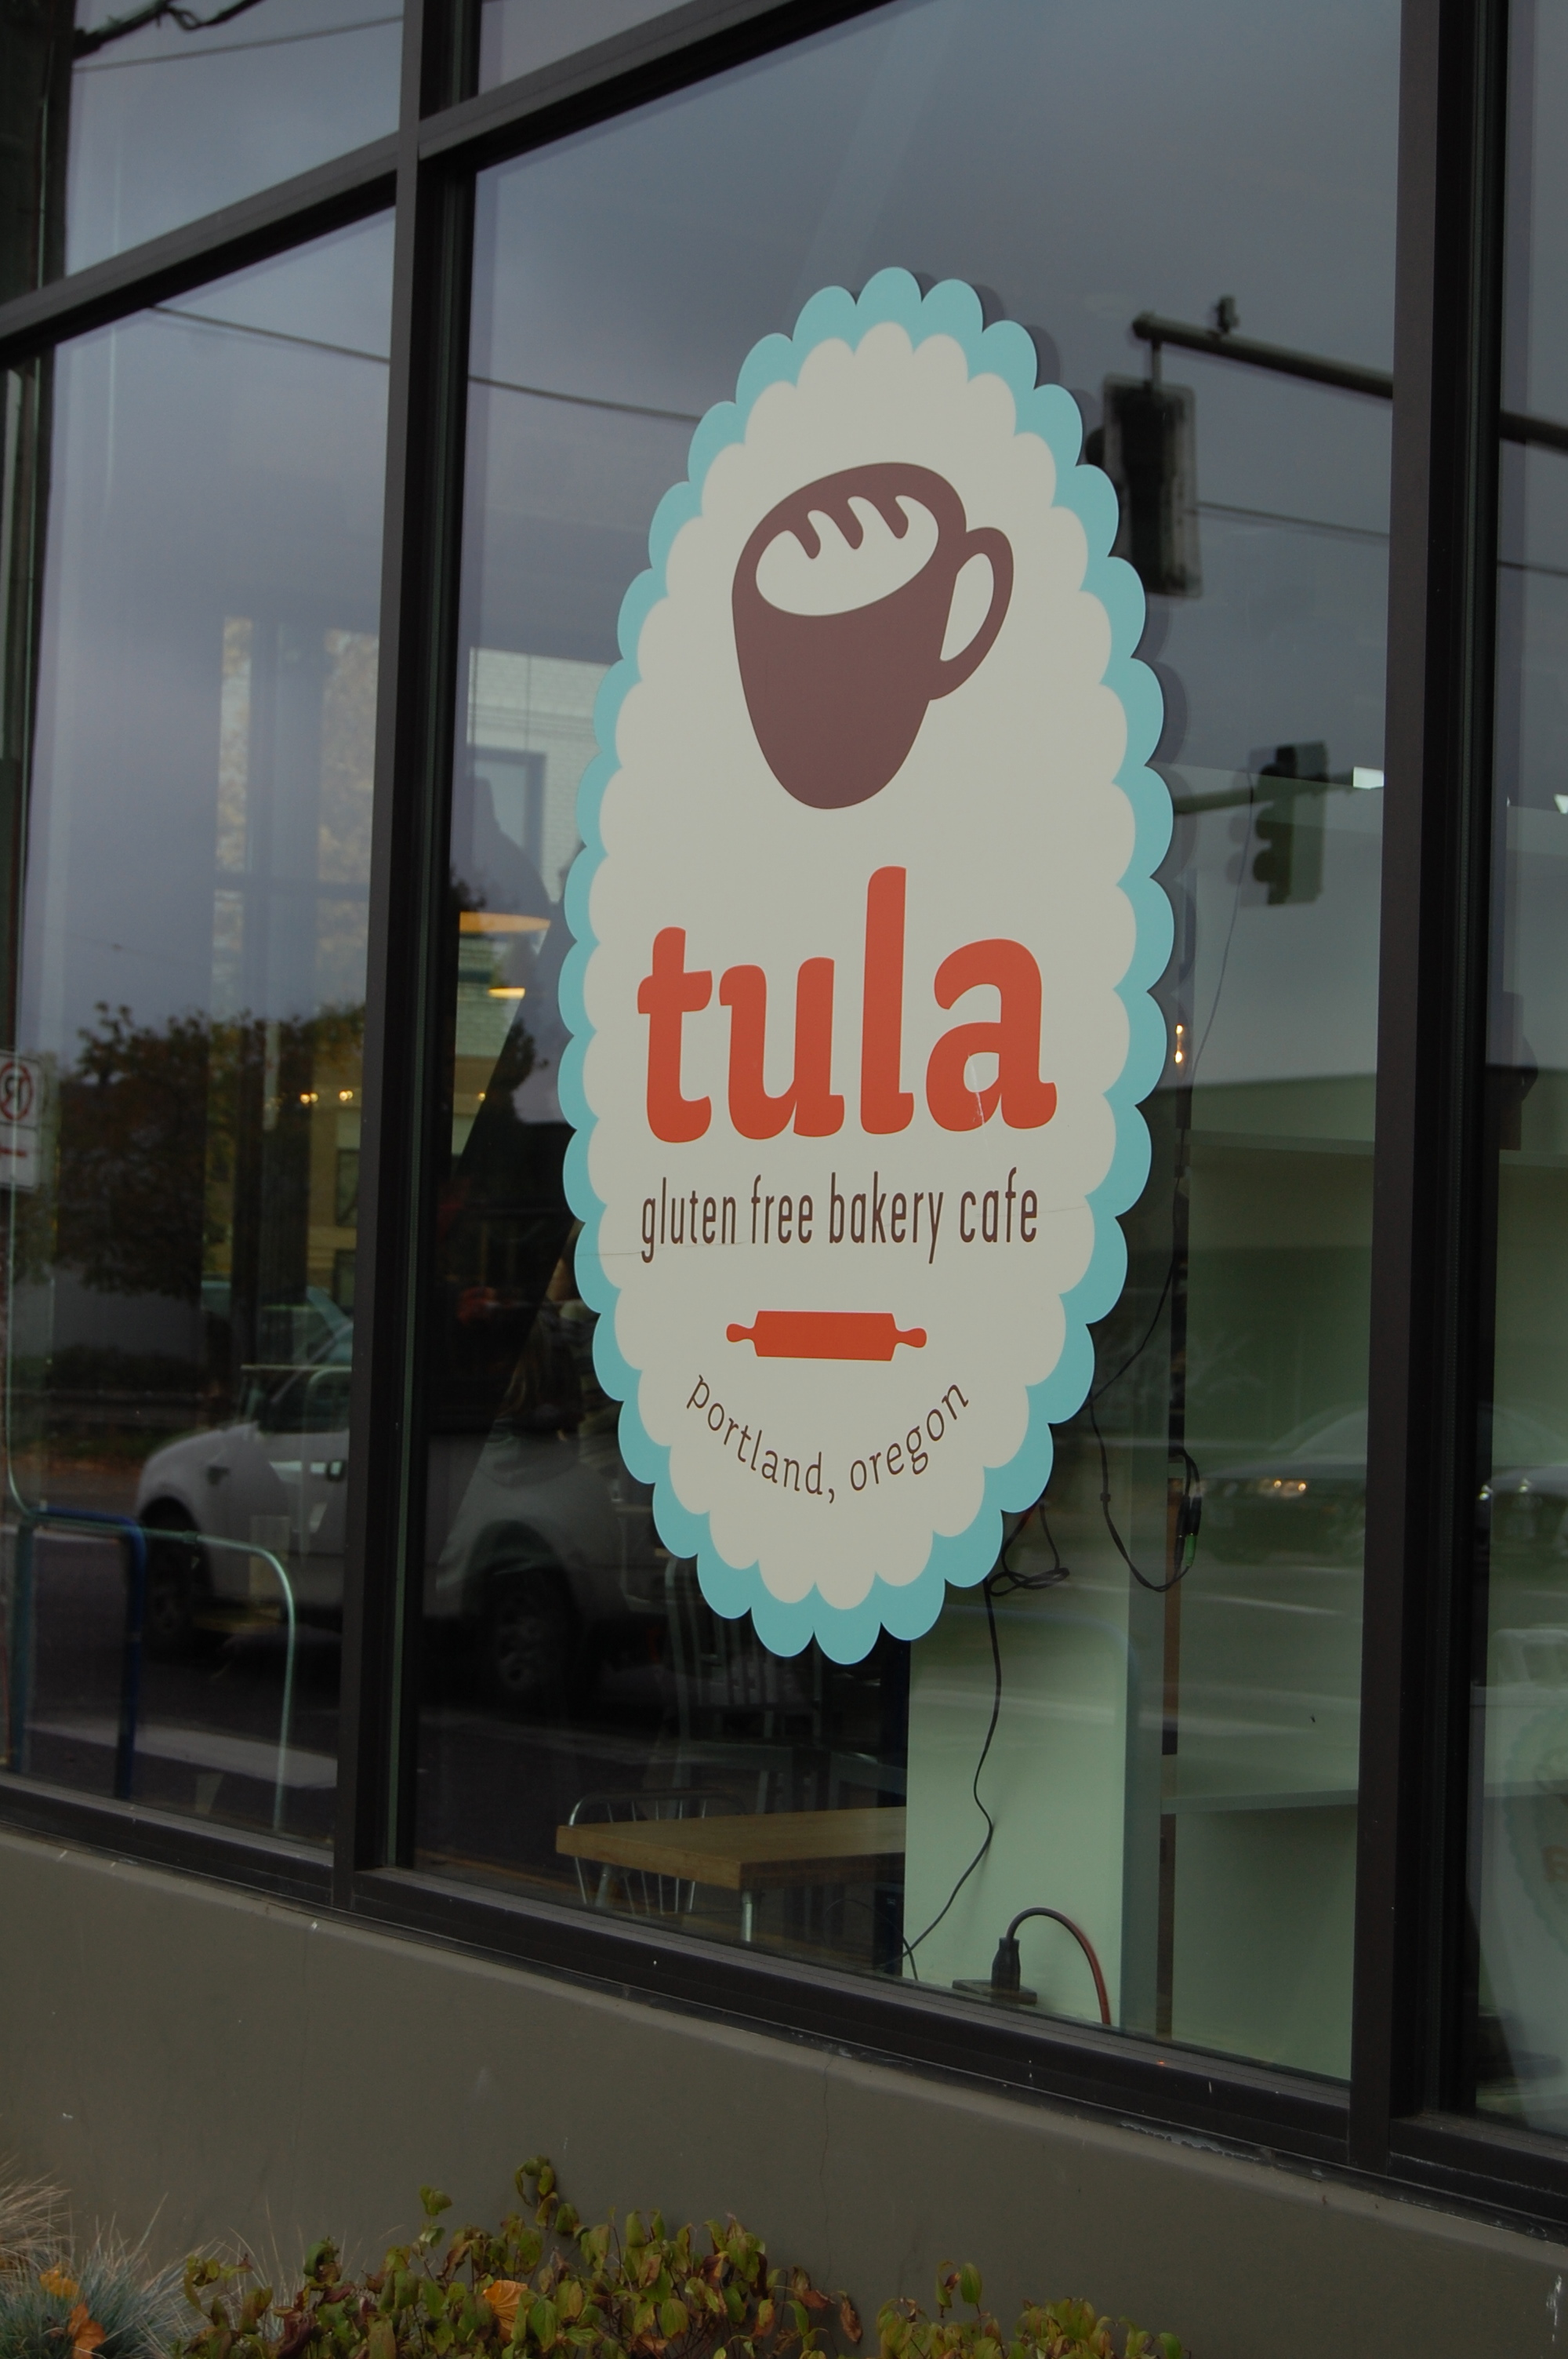 tula gluten free bakery cafe portland or